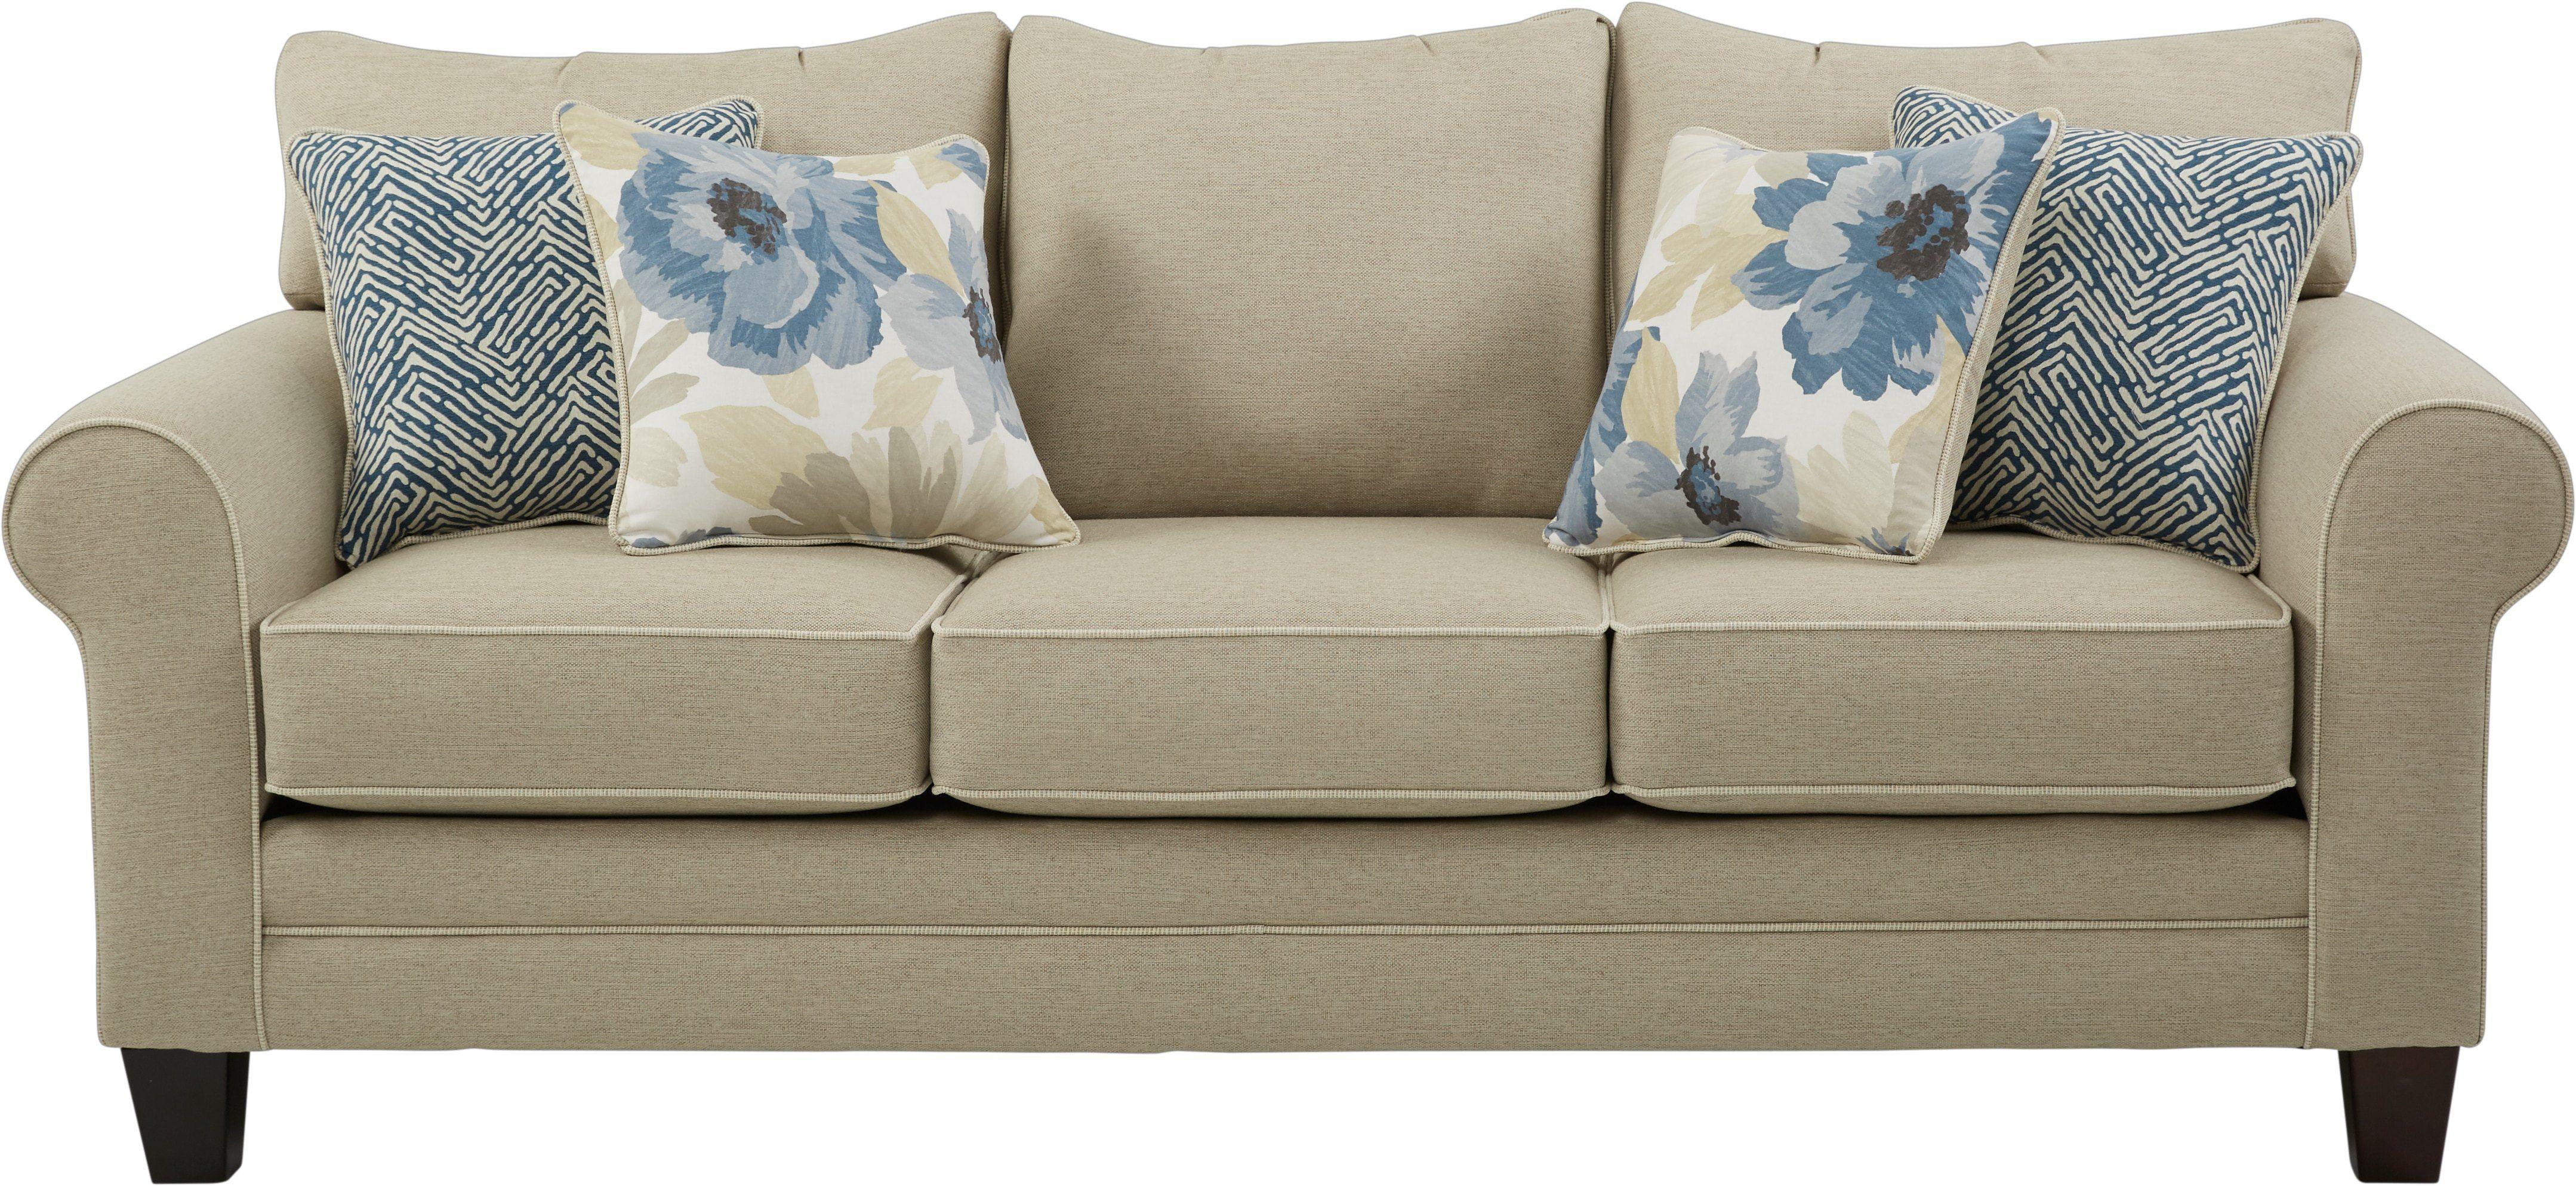 Beige Furniture Beige Sofa Living Room Furniture Collections Discount Living Room Furniture